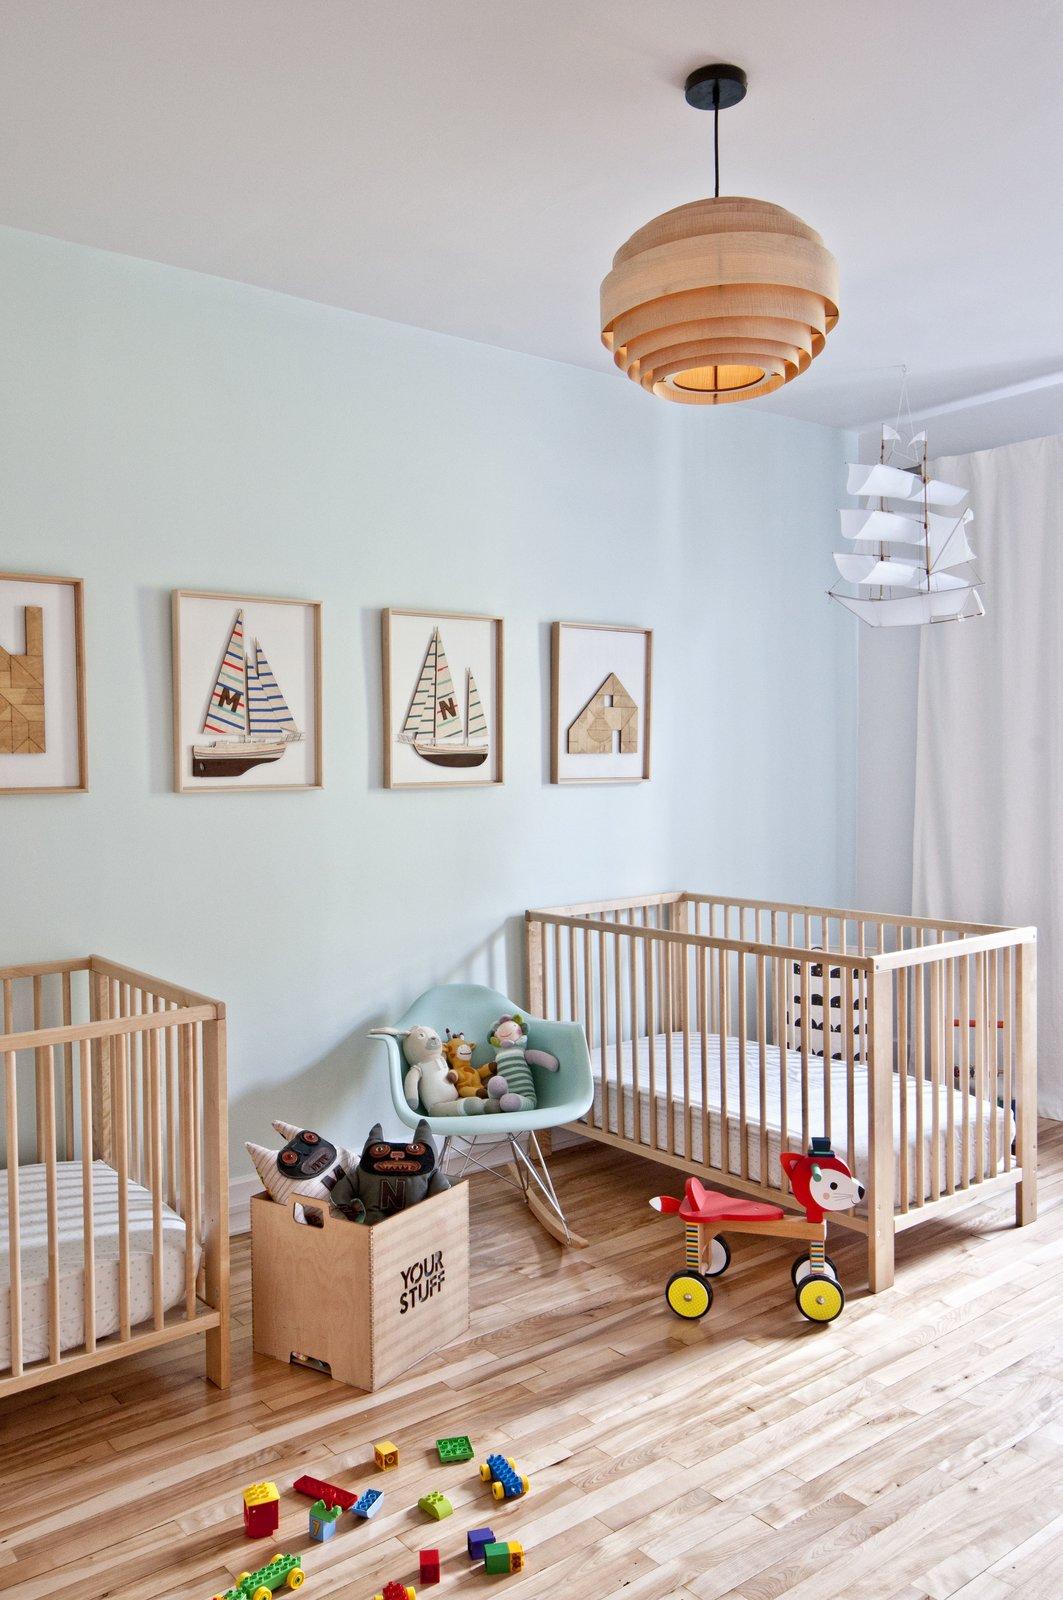 Tagged: Kids Room, Light Hardwood Floor, Bedroom, Bed, Toddler Age, and Neutral Gender.  Fabre Residence by Jonathan Dorthe